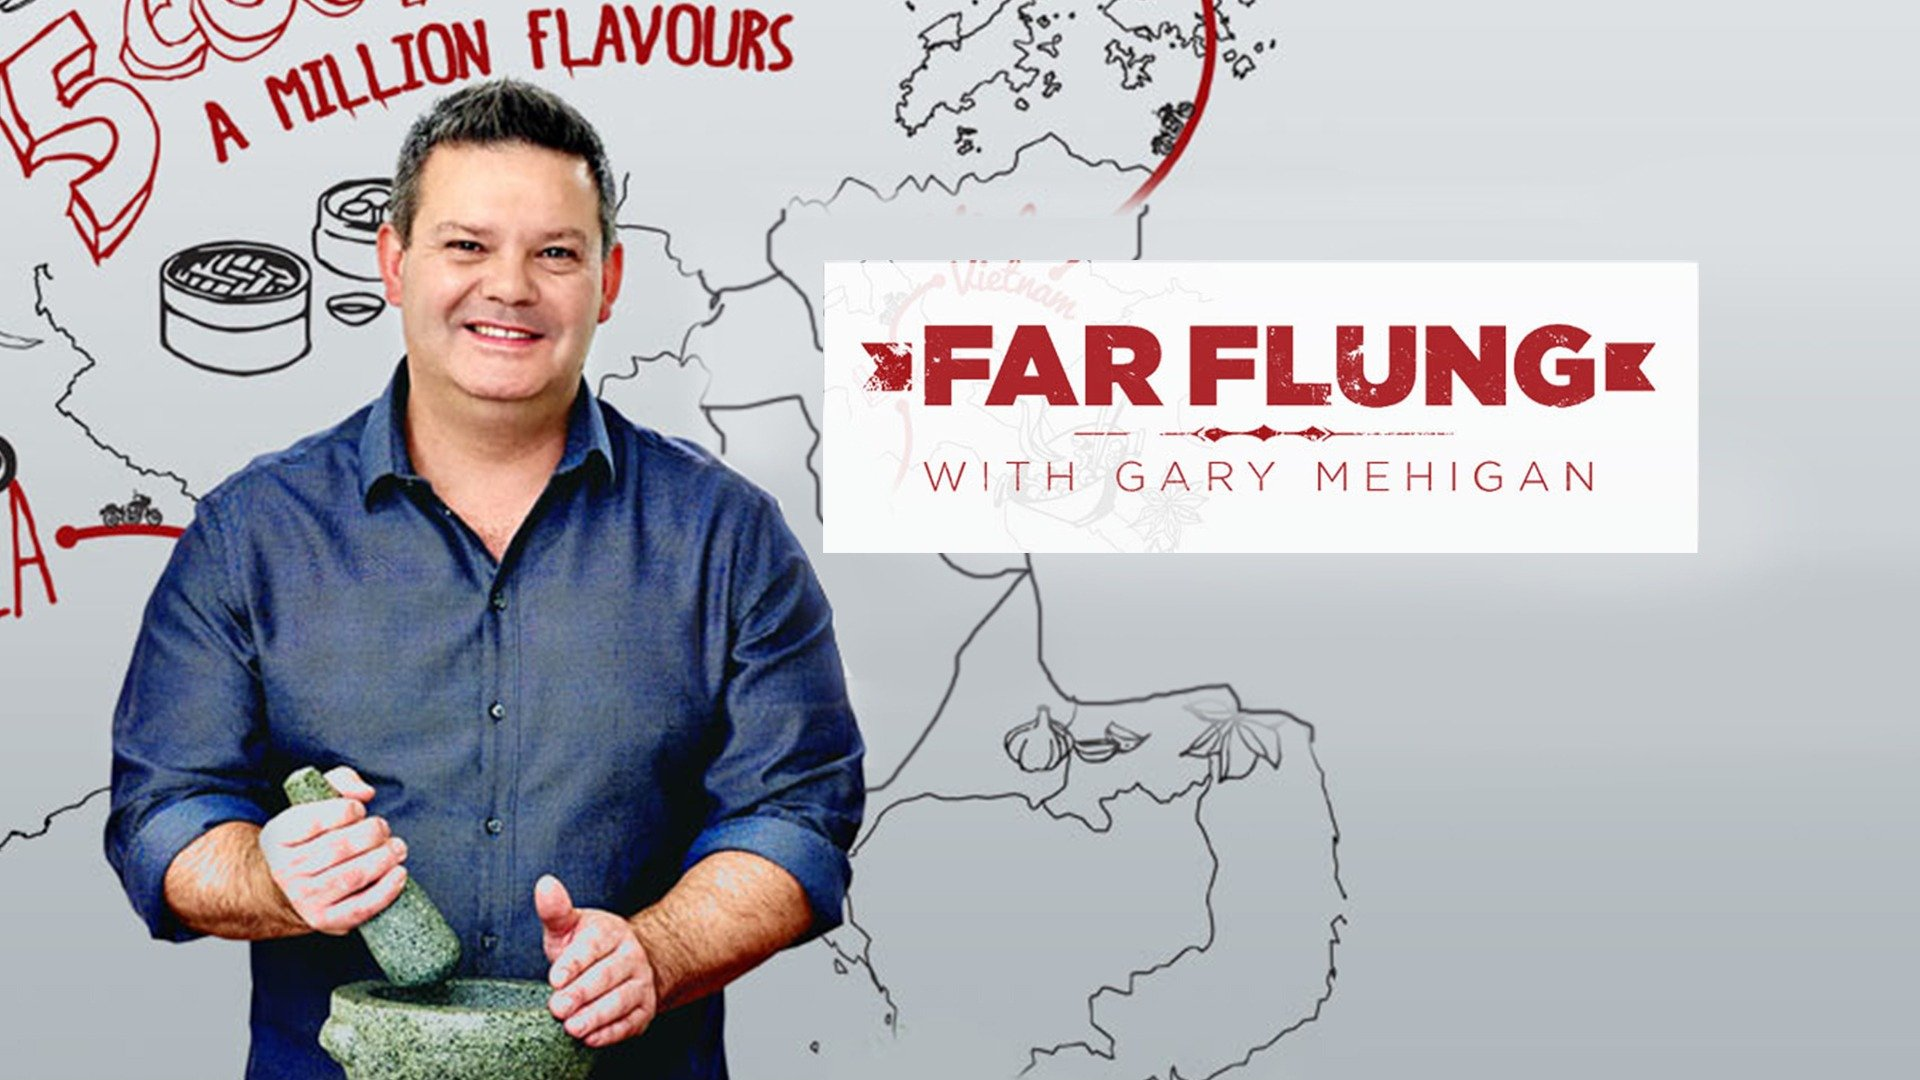 Far Flung with Gary Mehigan